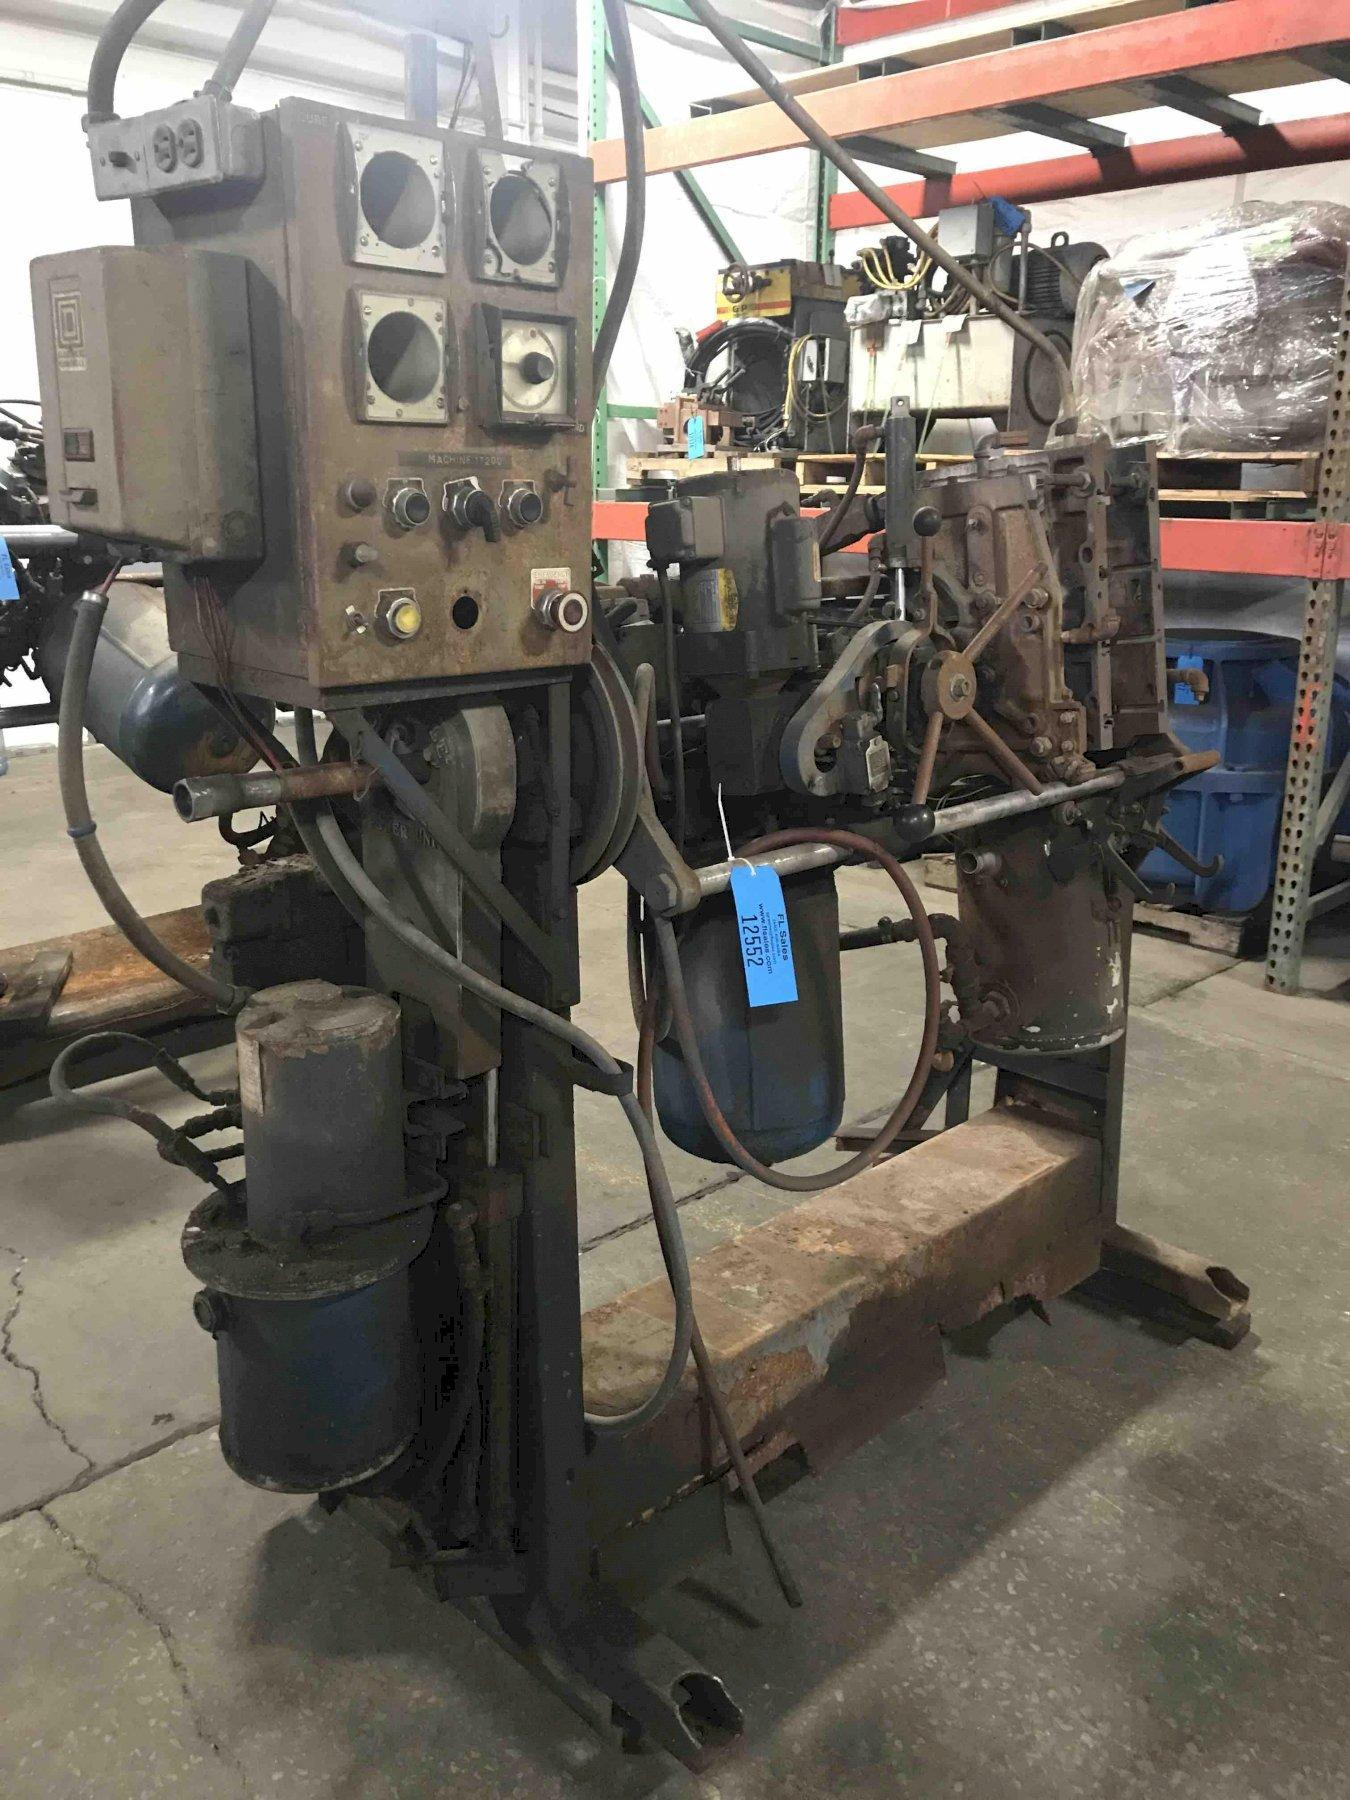 Dependable model 200fa shell core machine s/n 165 no gas panel